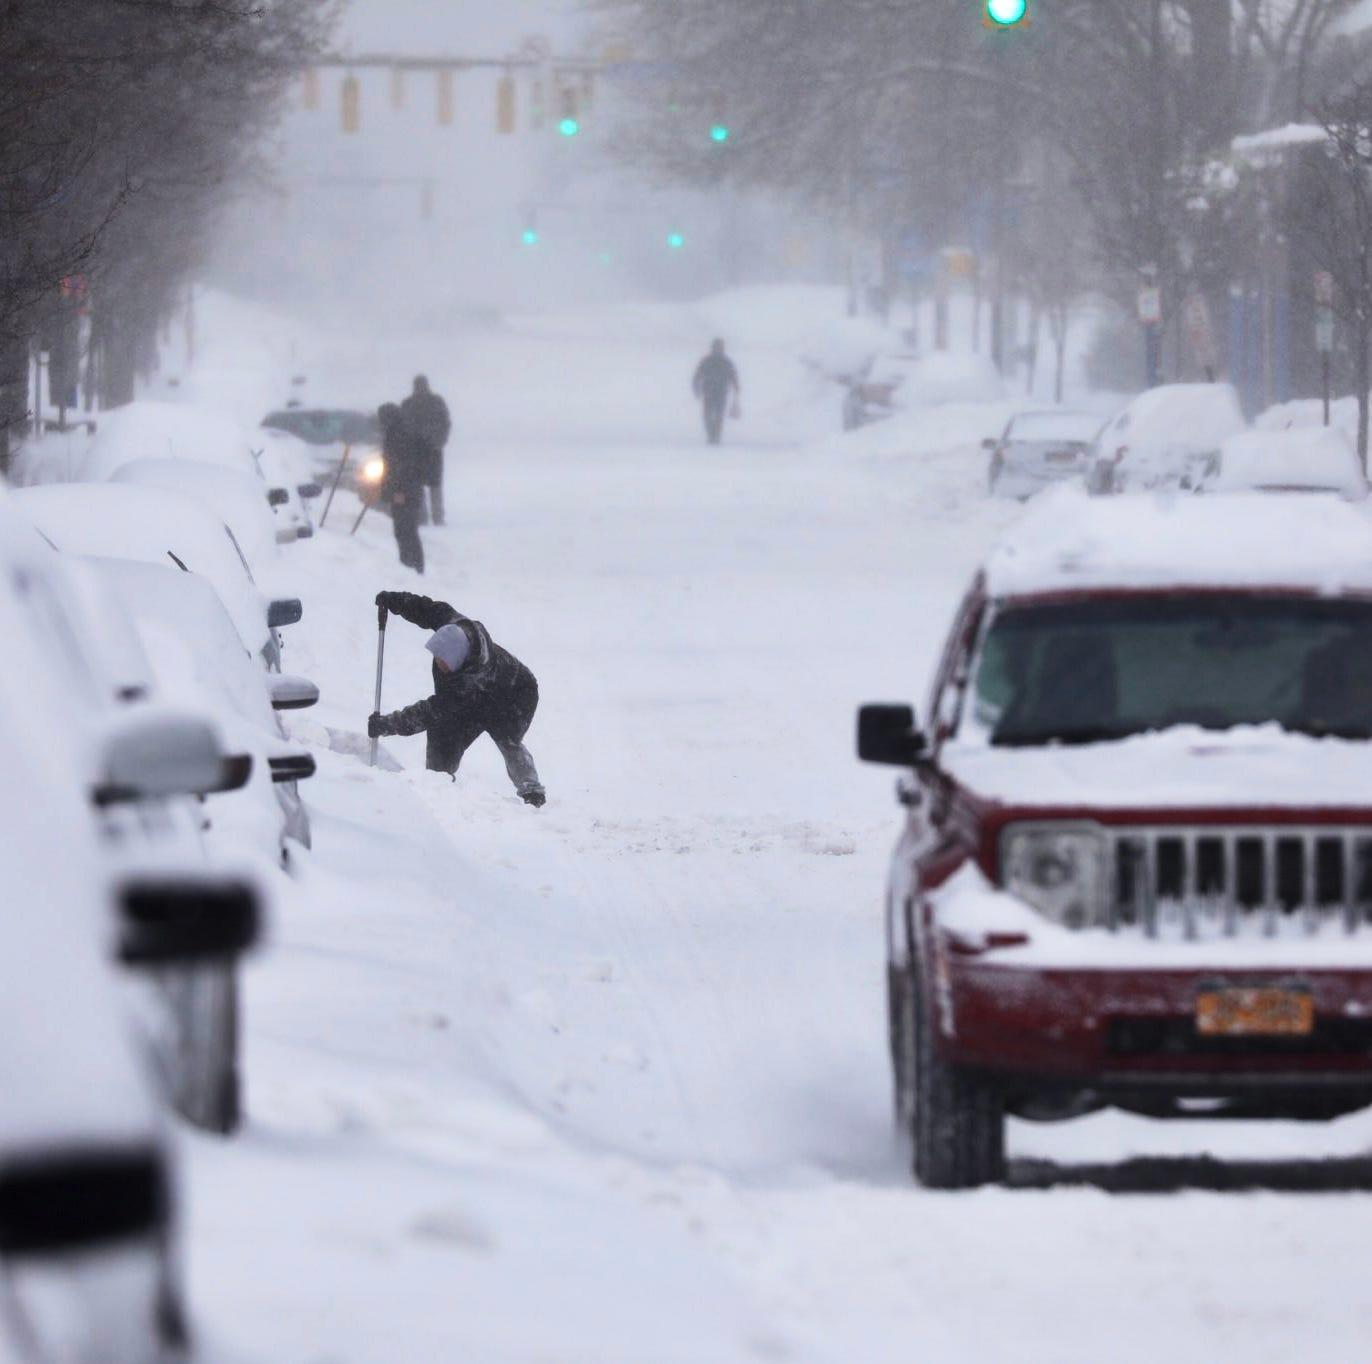 Brutal cold follows hard on the heels of major snowfall across Rochester region